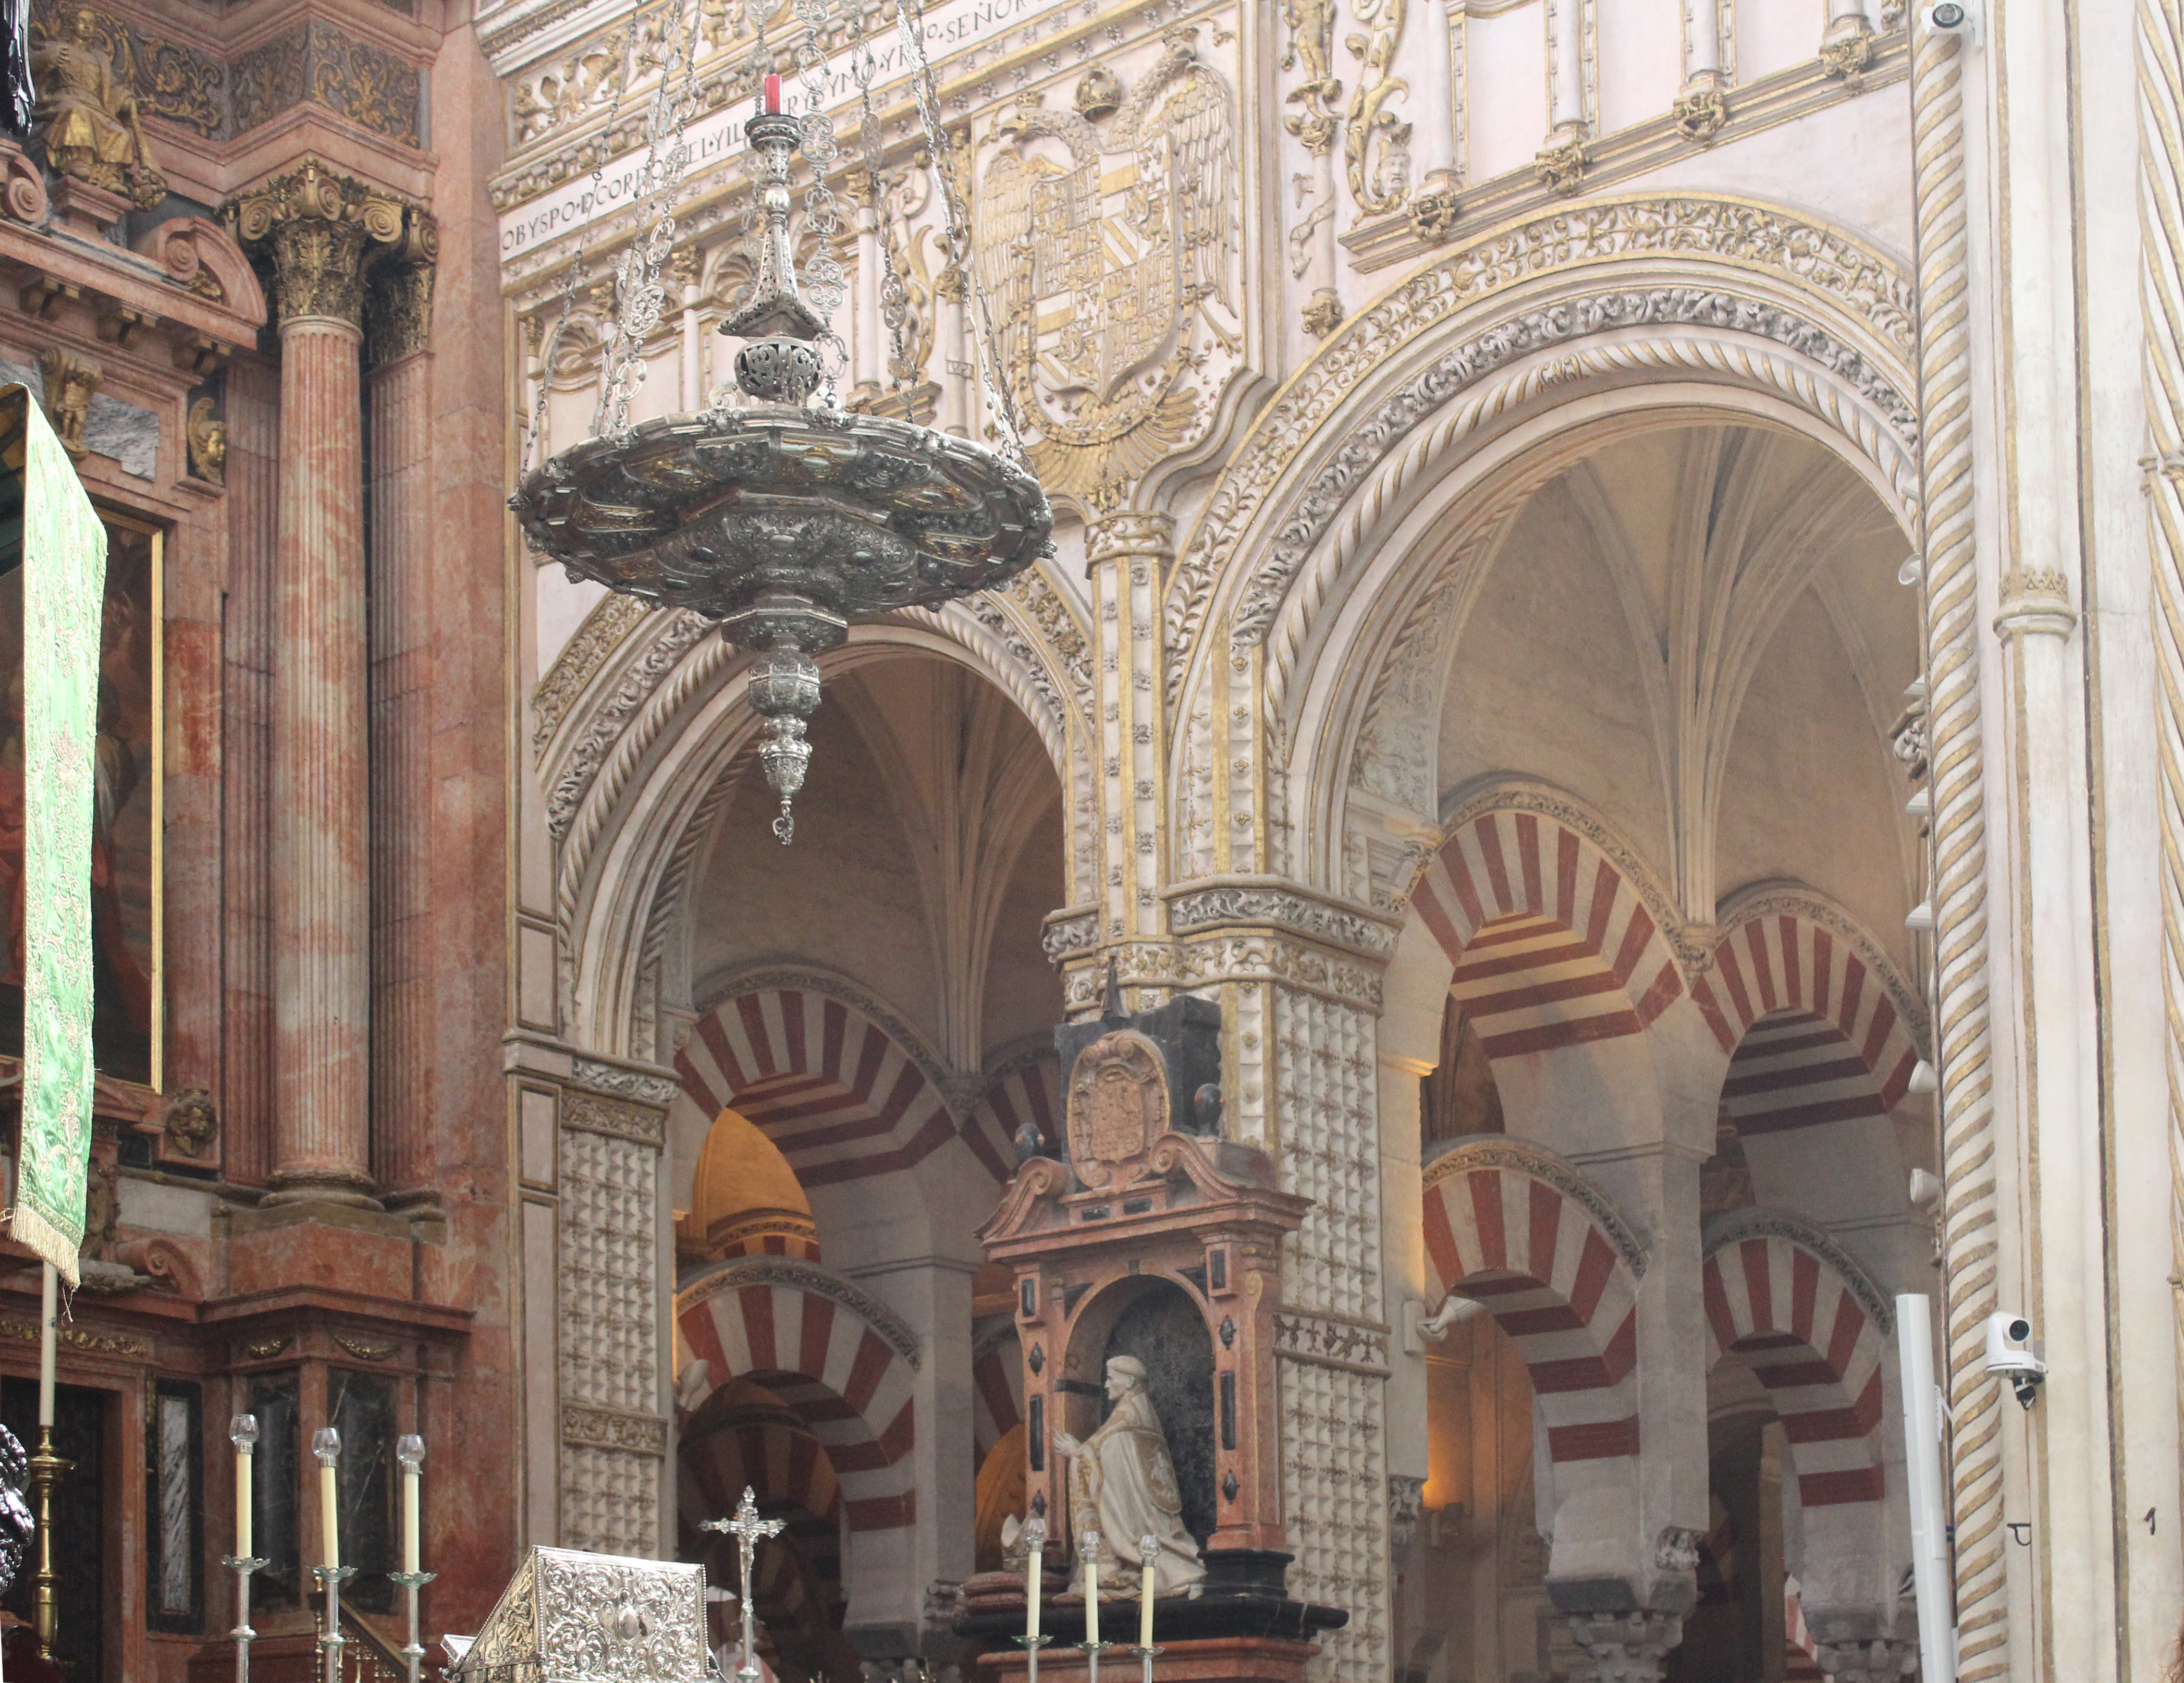 Mezquita Picture: File:Mezquita-Catedral De Córdoba